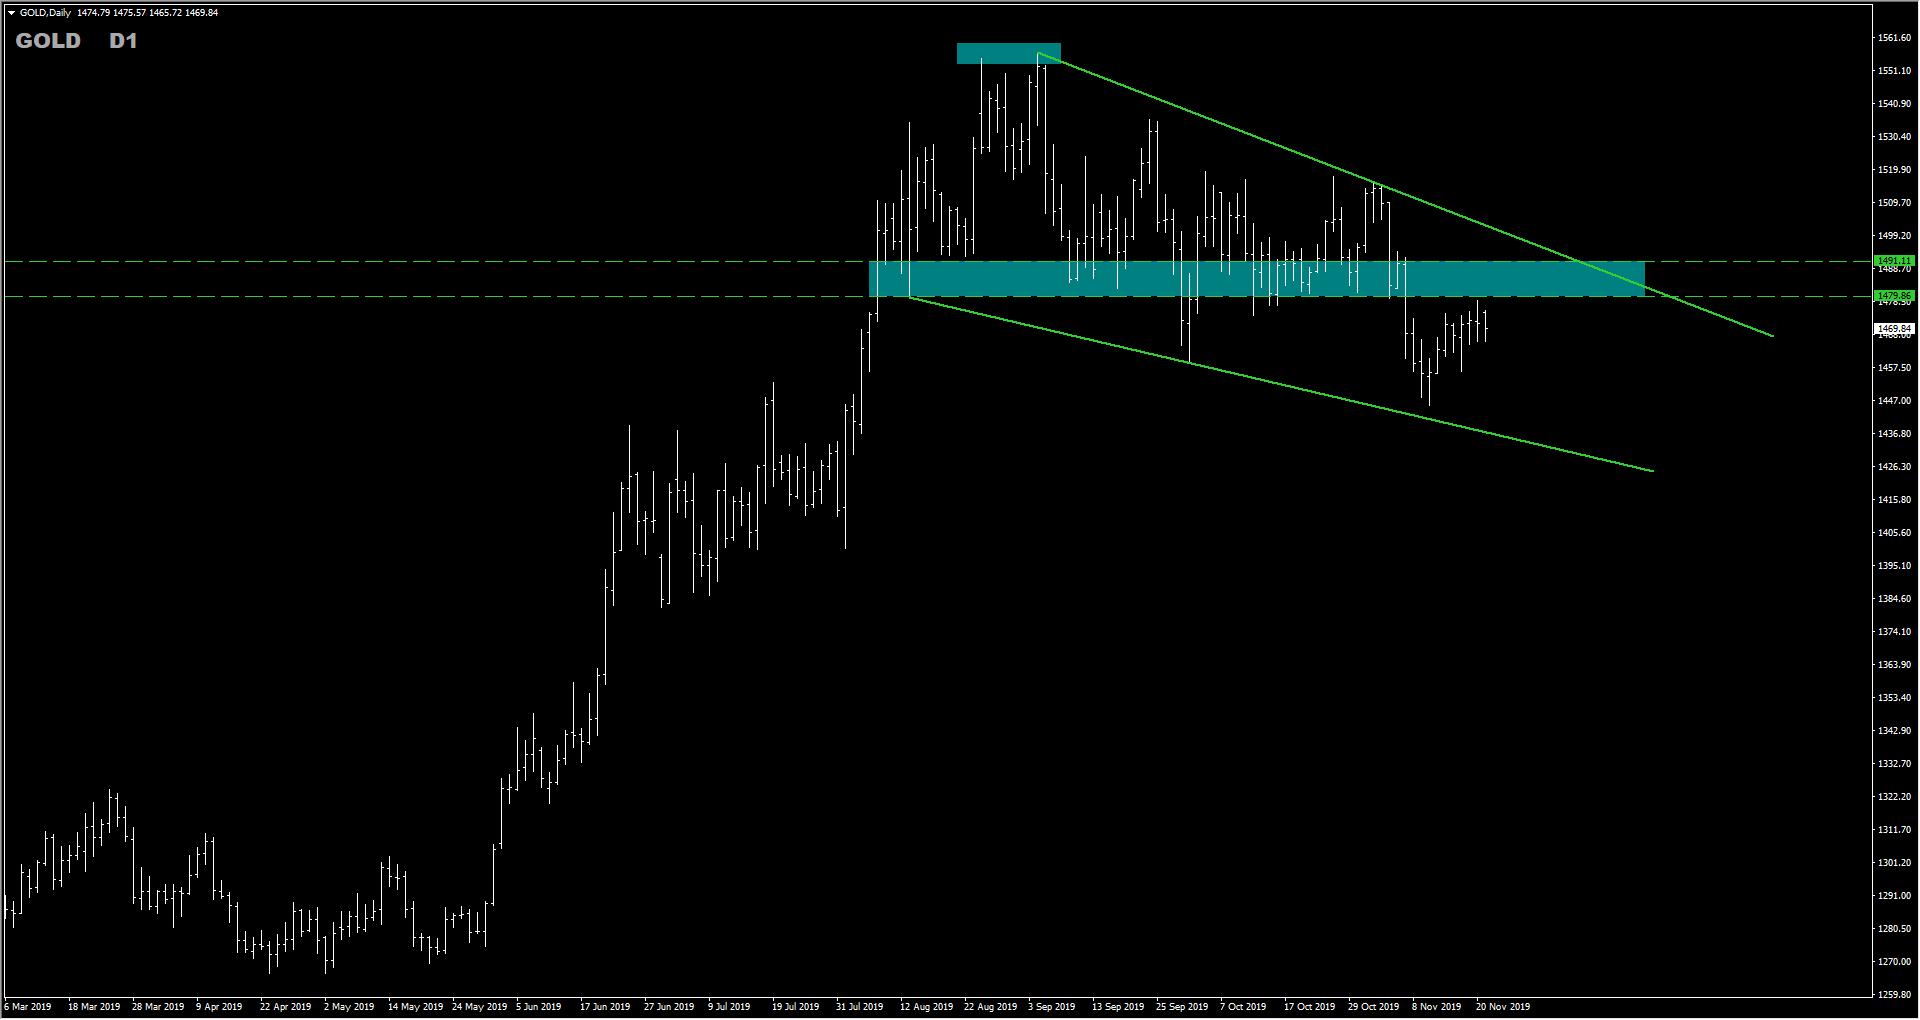 Trade Idea: Gold Sell Opportunity Inside Falling Wedge Pattern